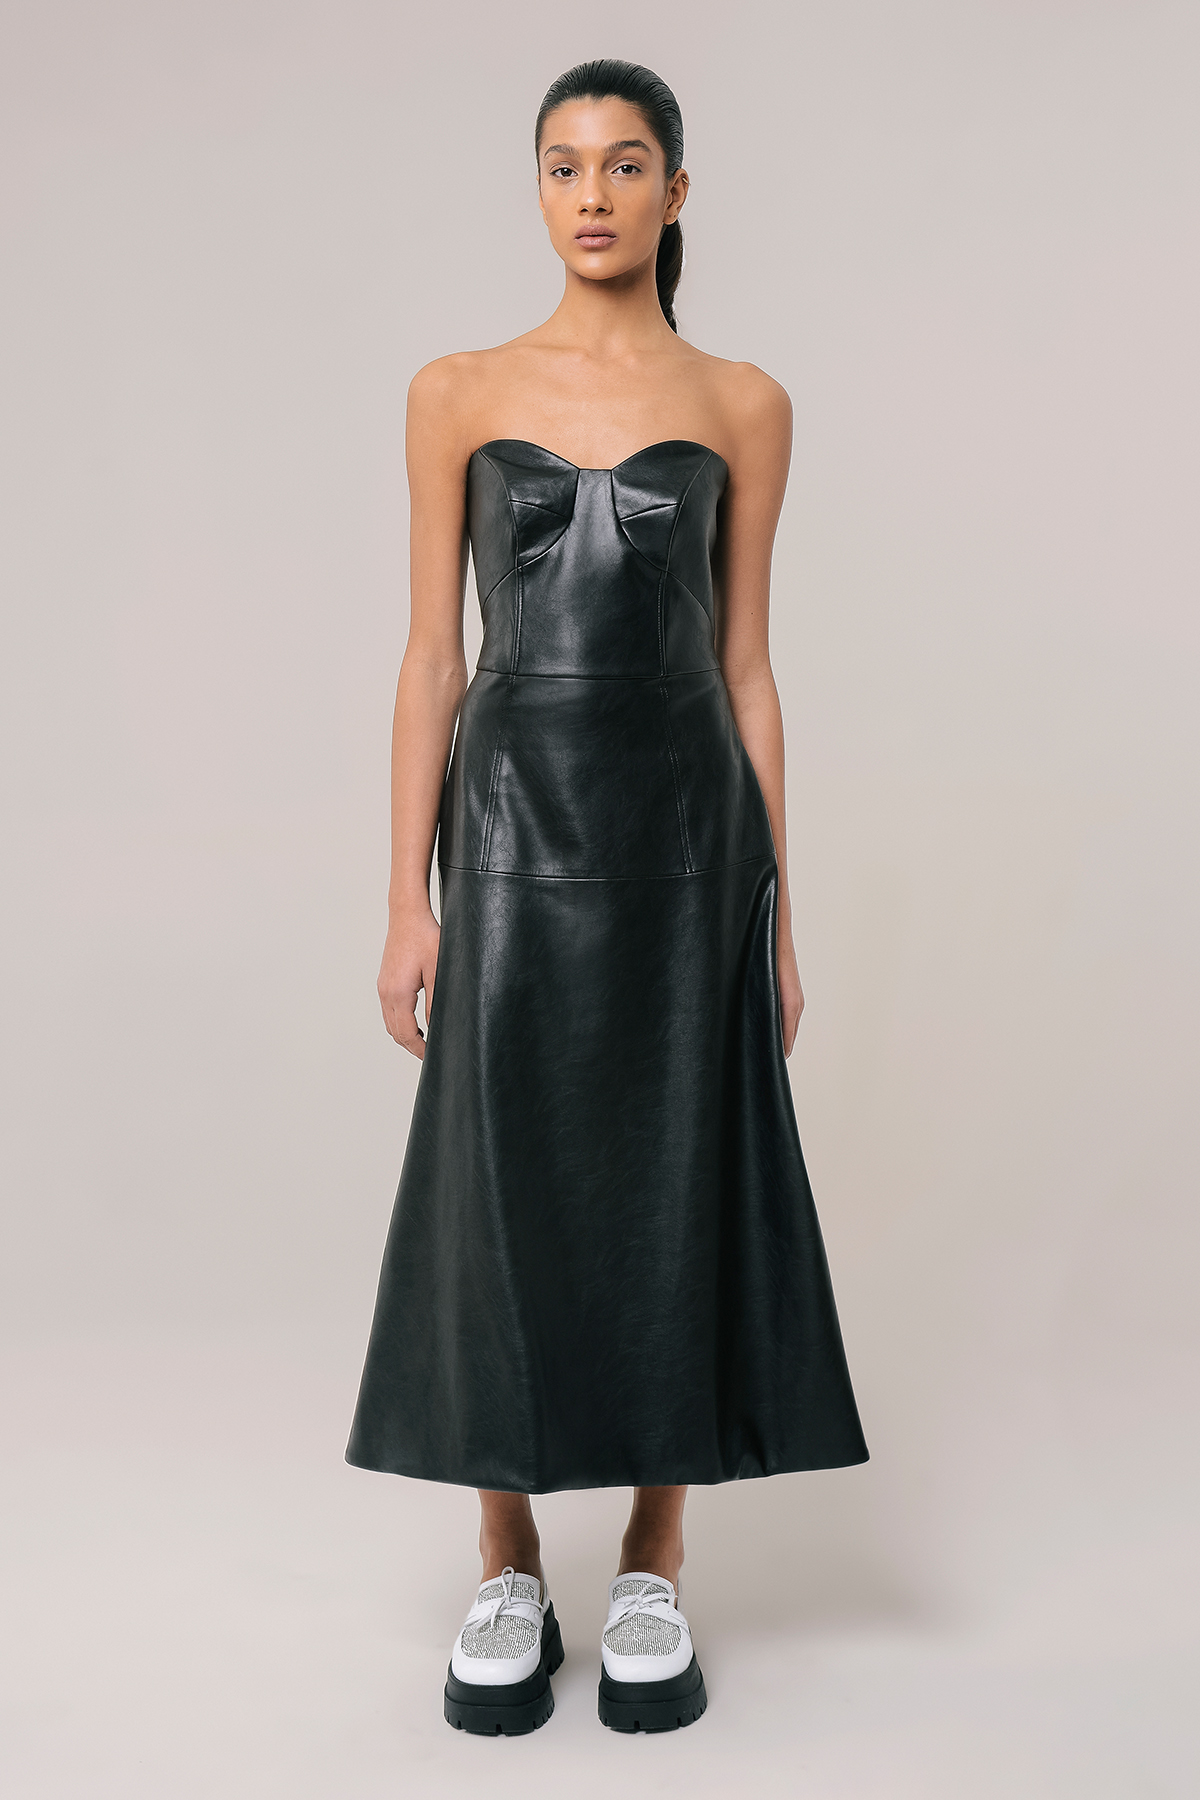 Vegan leather corset dress